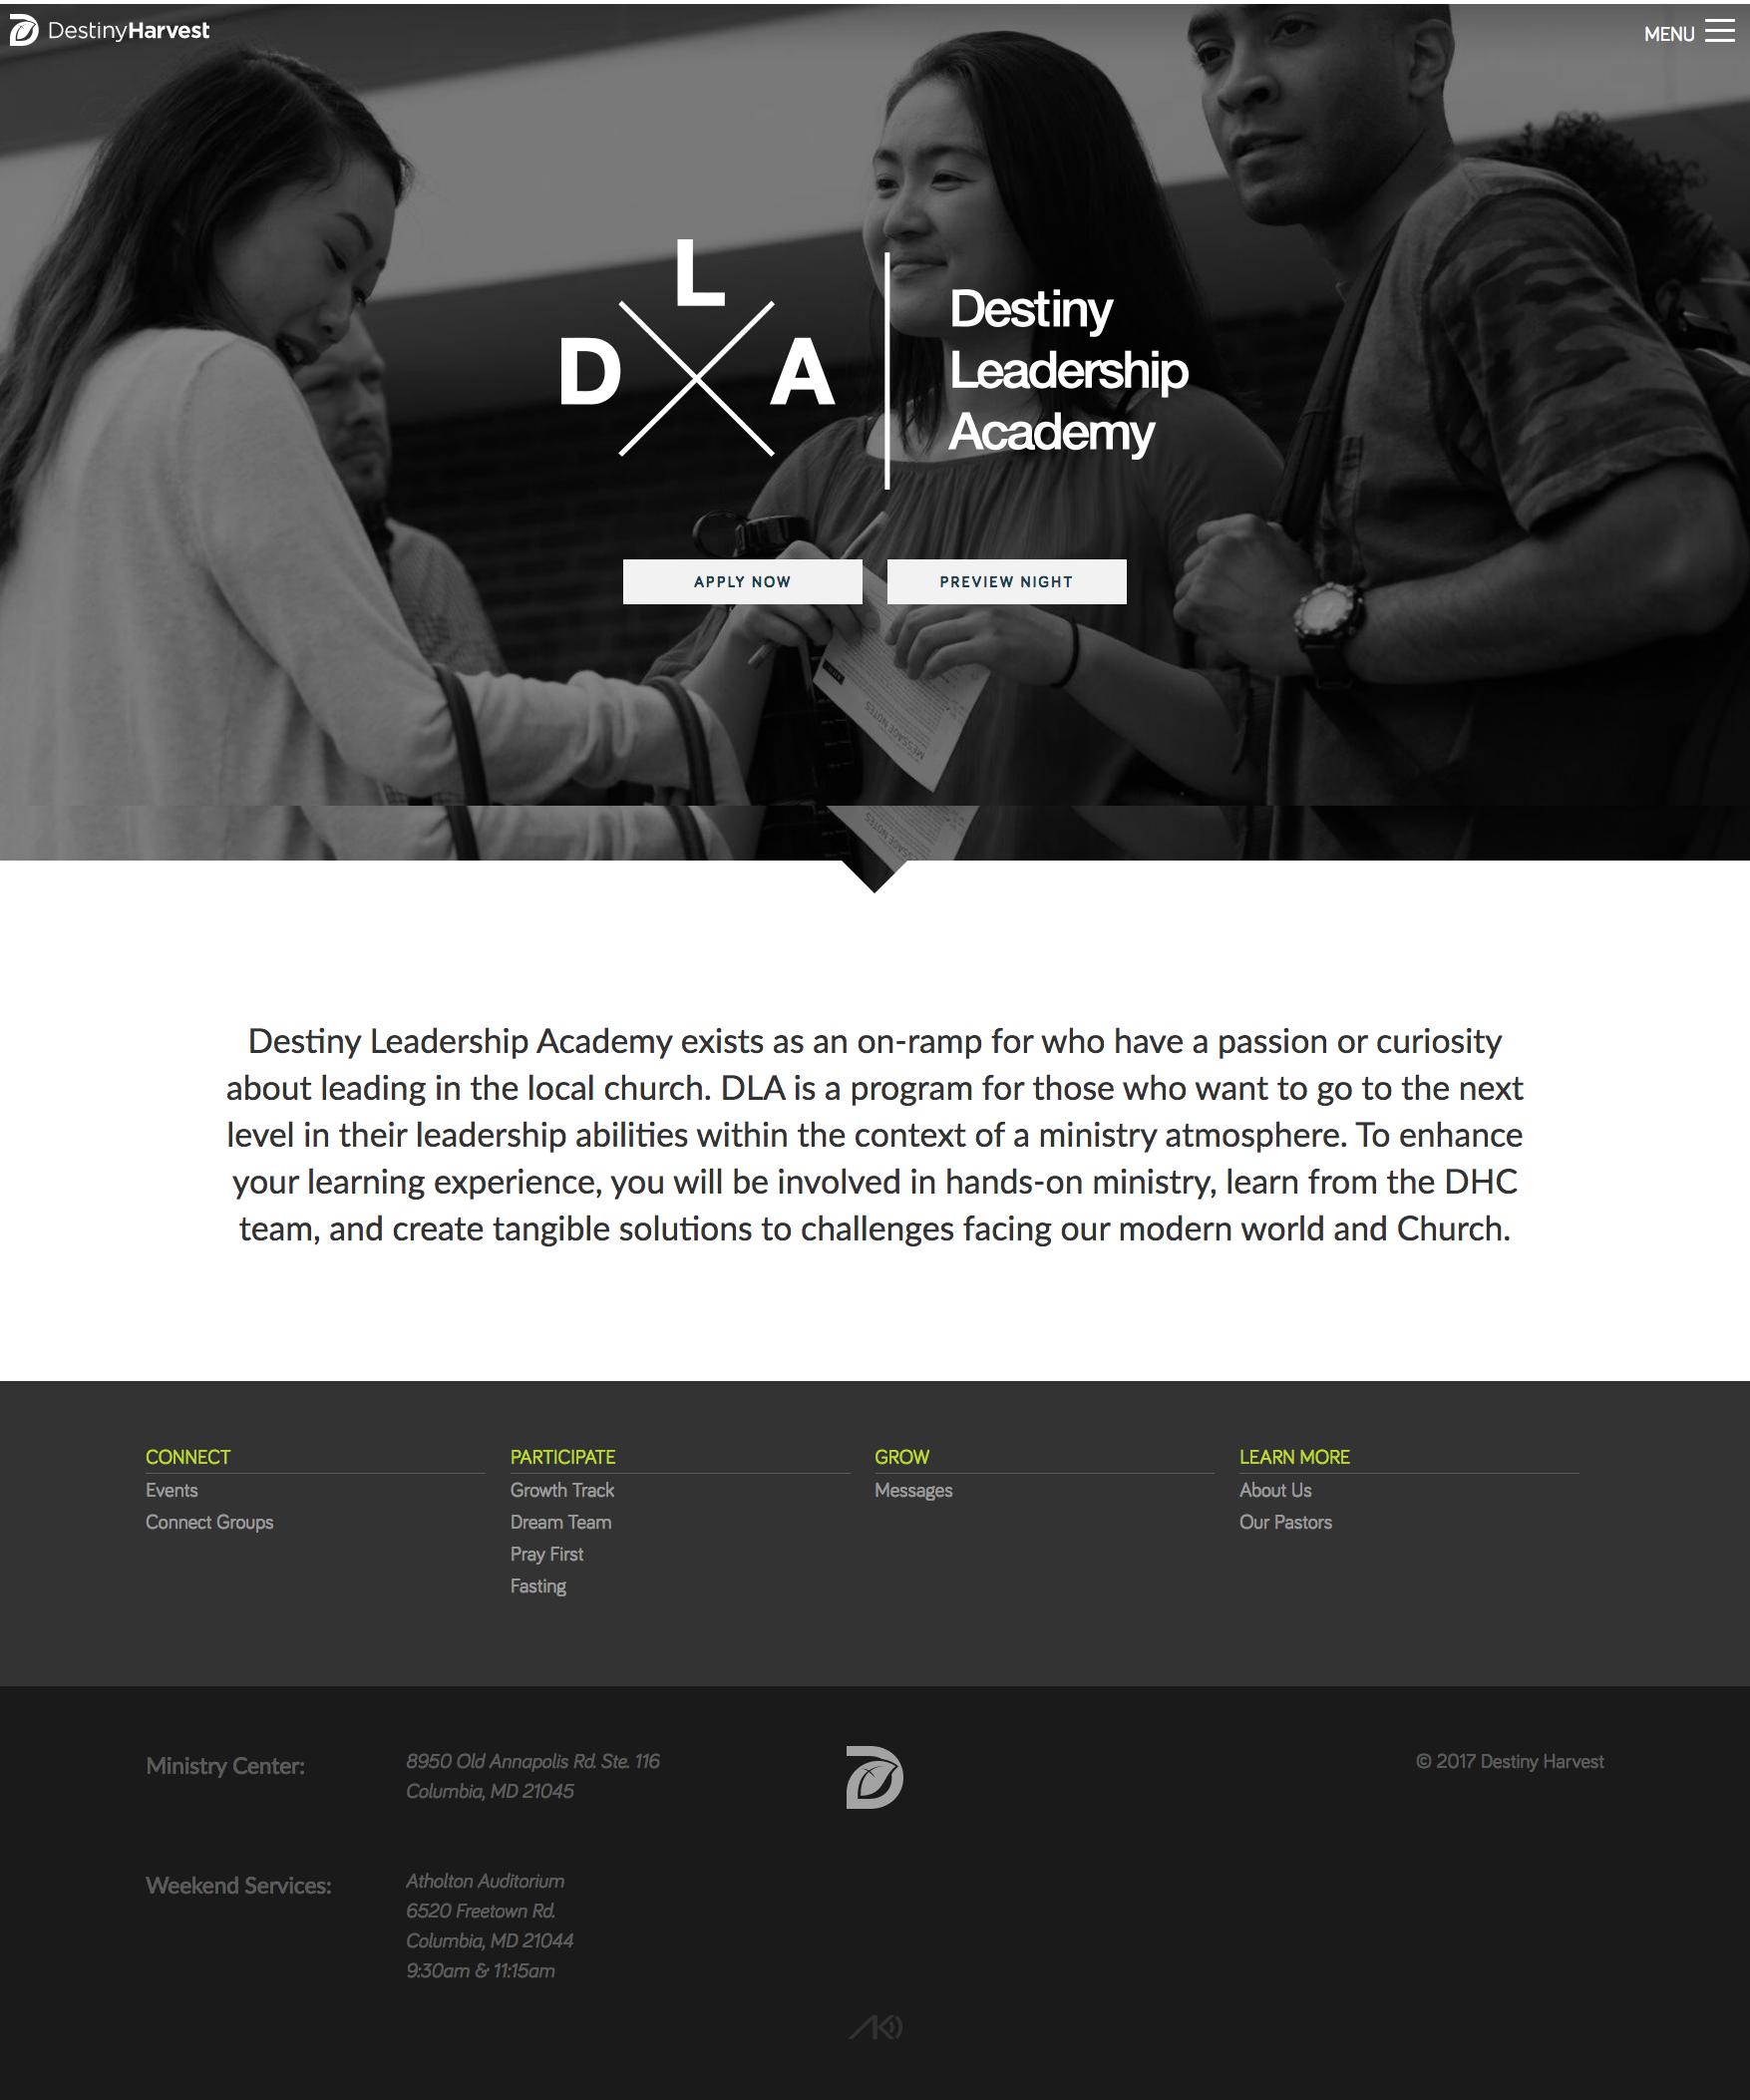 Destiny Leadership Academy